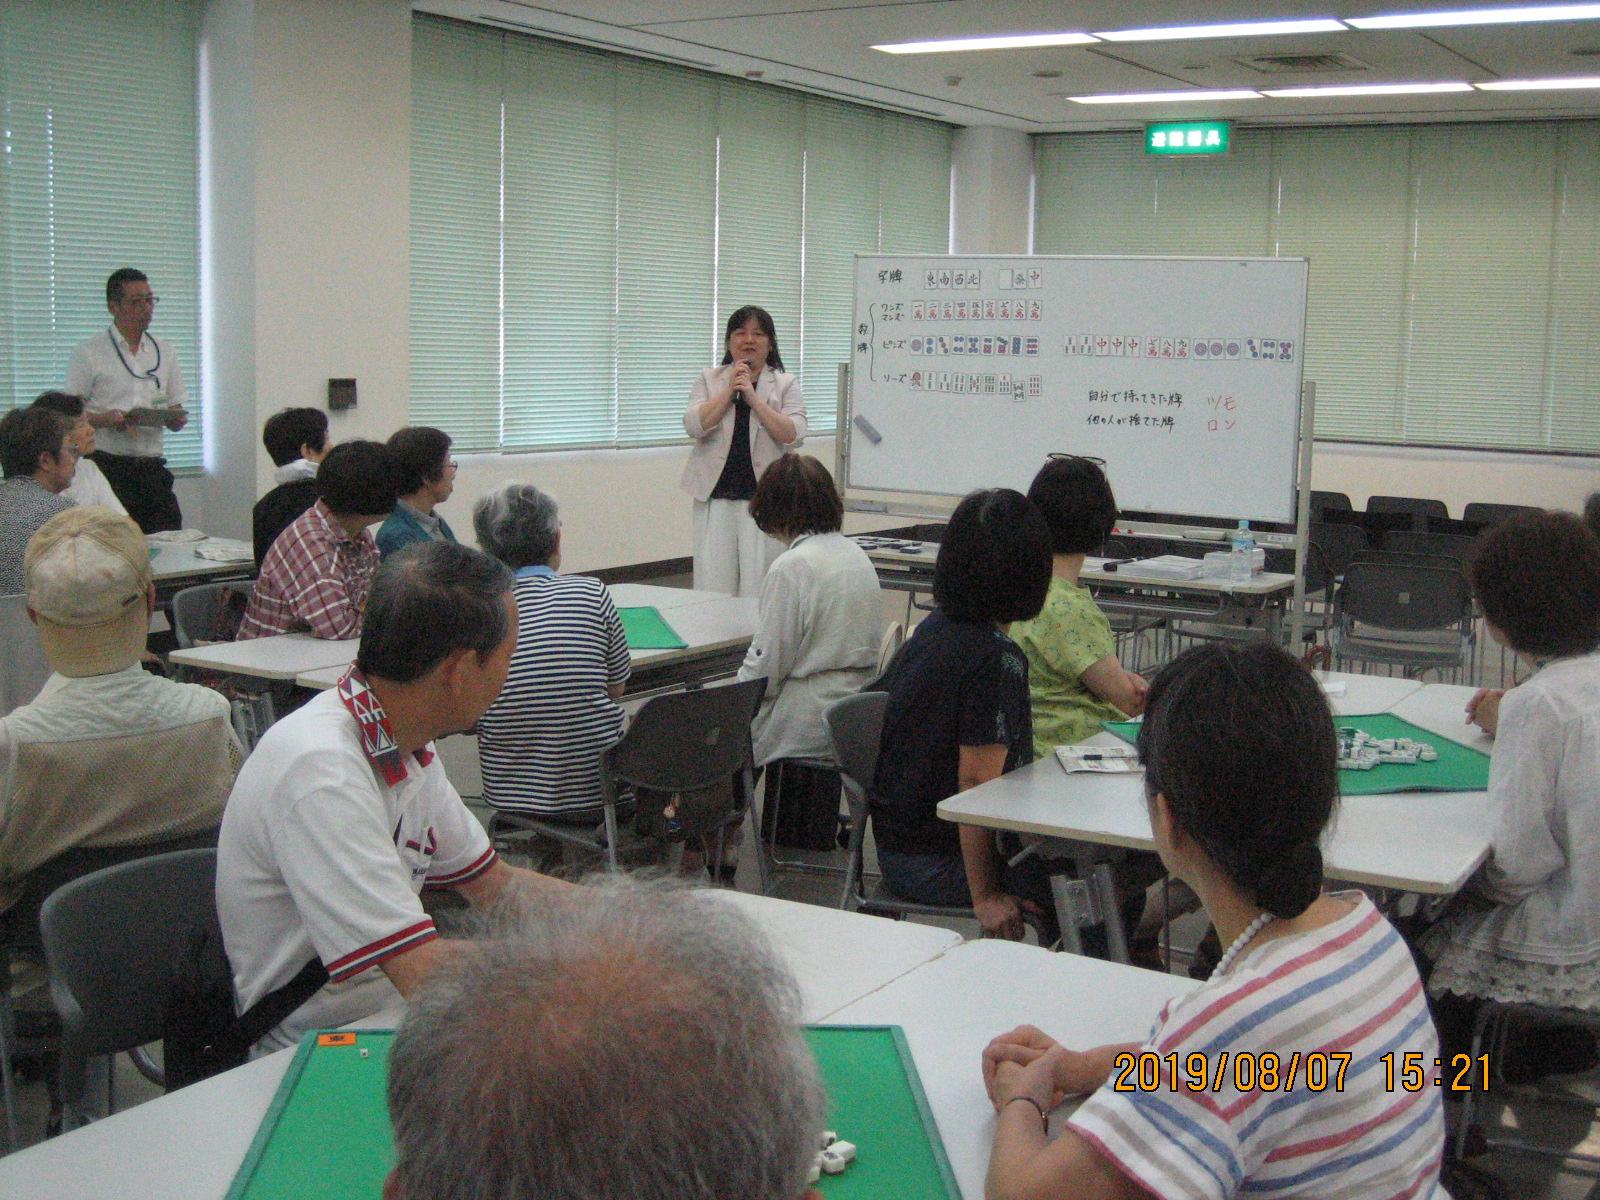 清川プロ講義